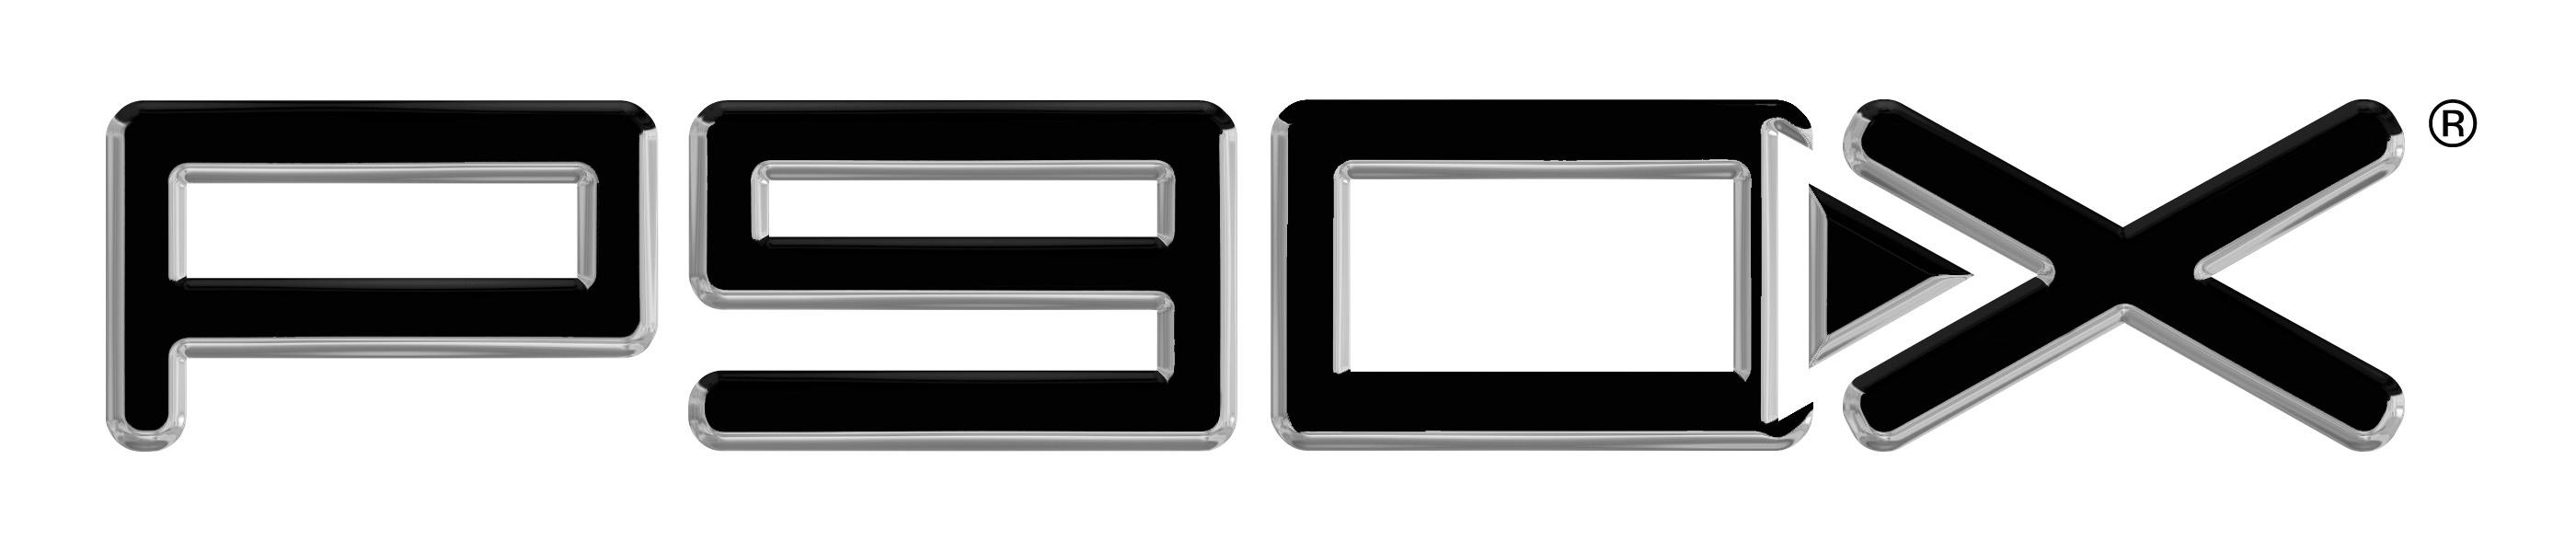 P90x Logo Vector P90x logo png  P90x Logo Vector